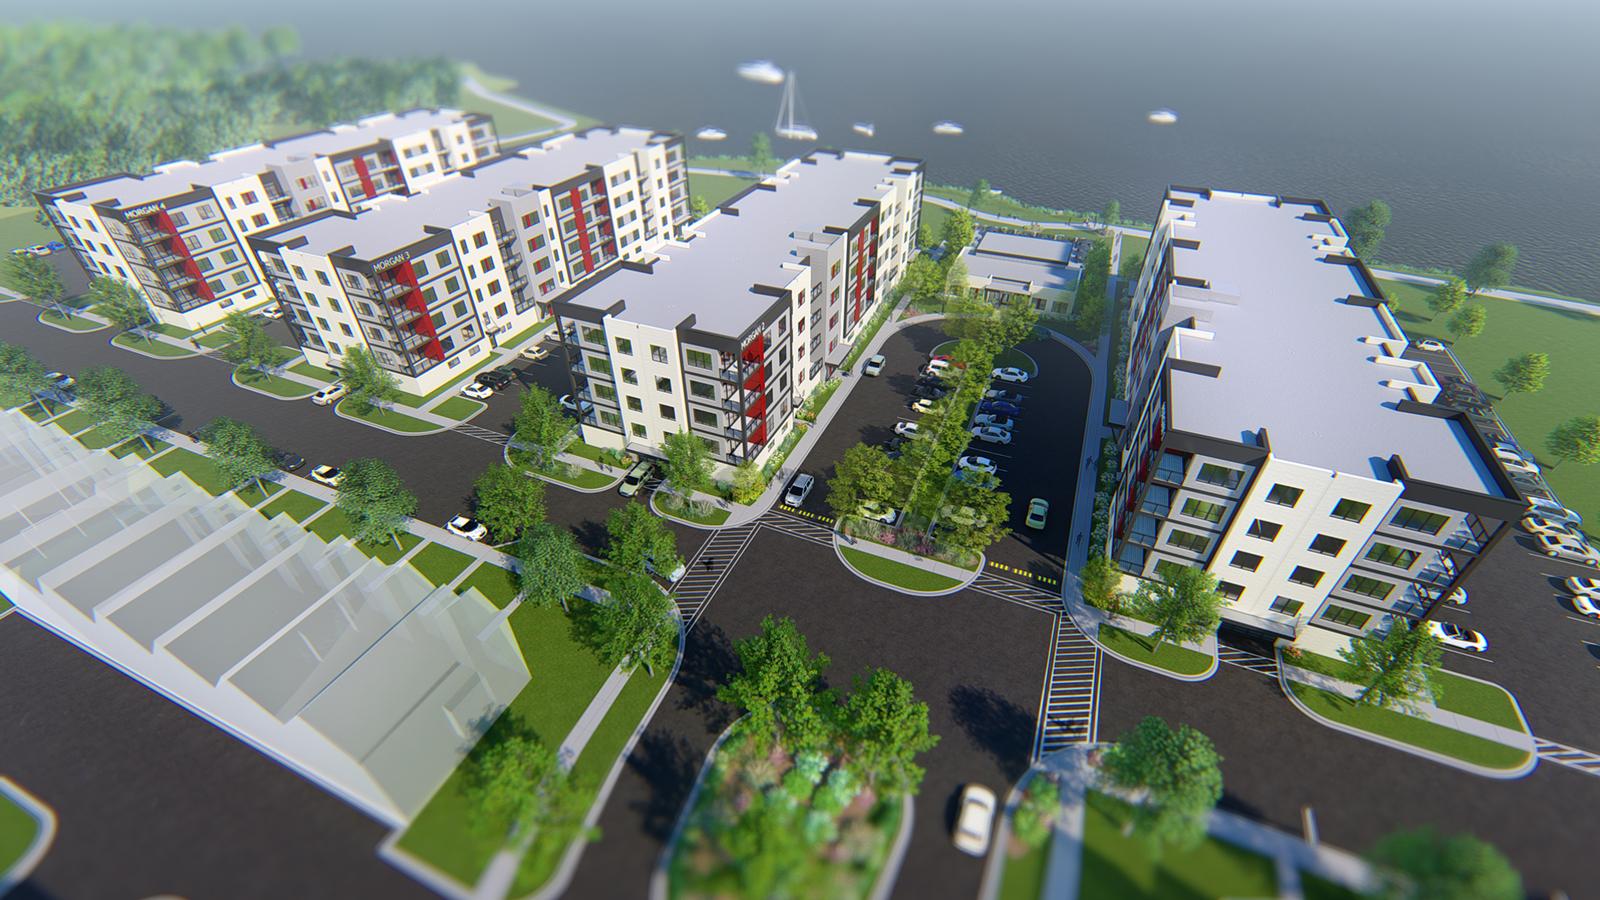 Aerial View | Morgan District | Oshkosh, Wis. | Main Intersection | JLA Architects